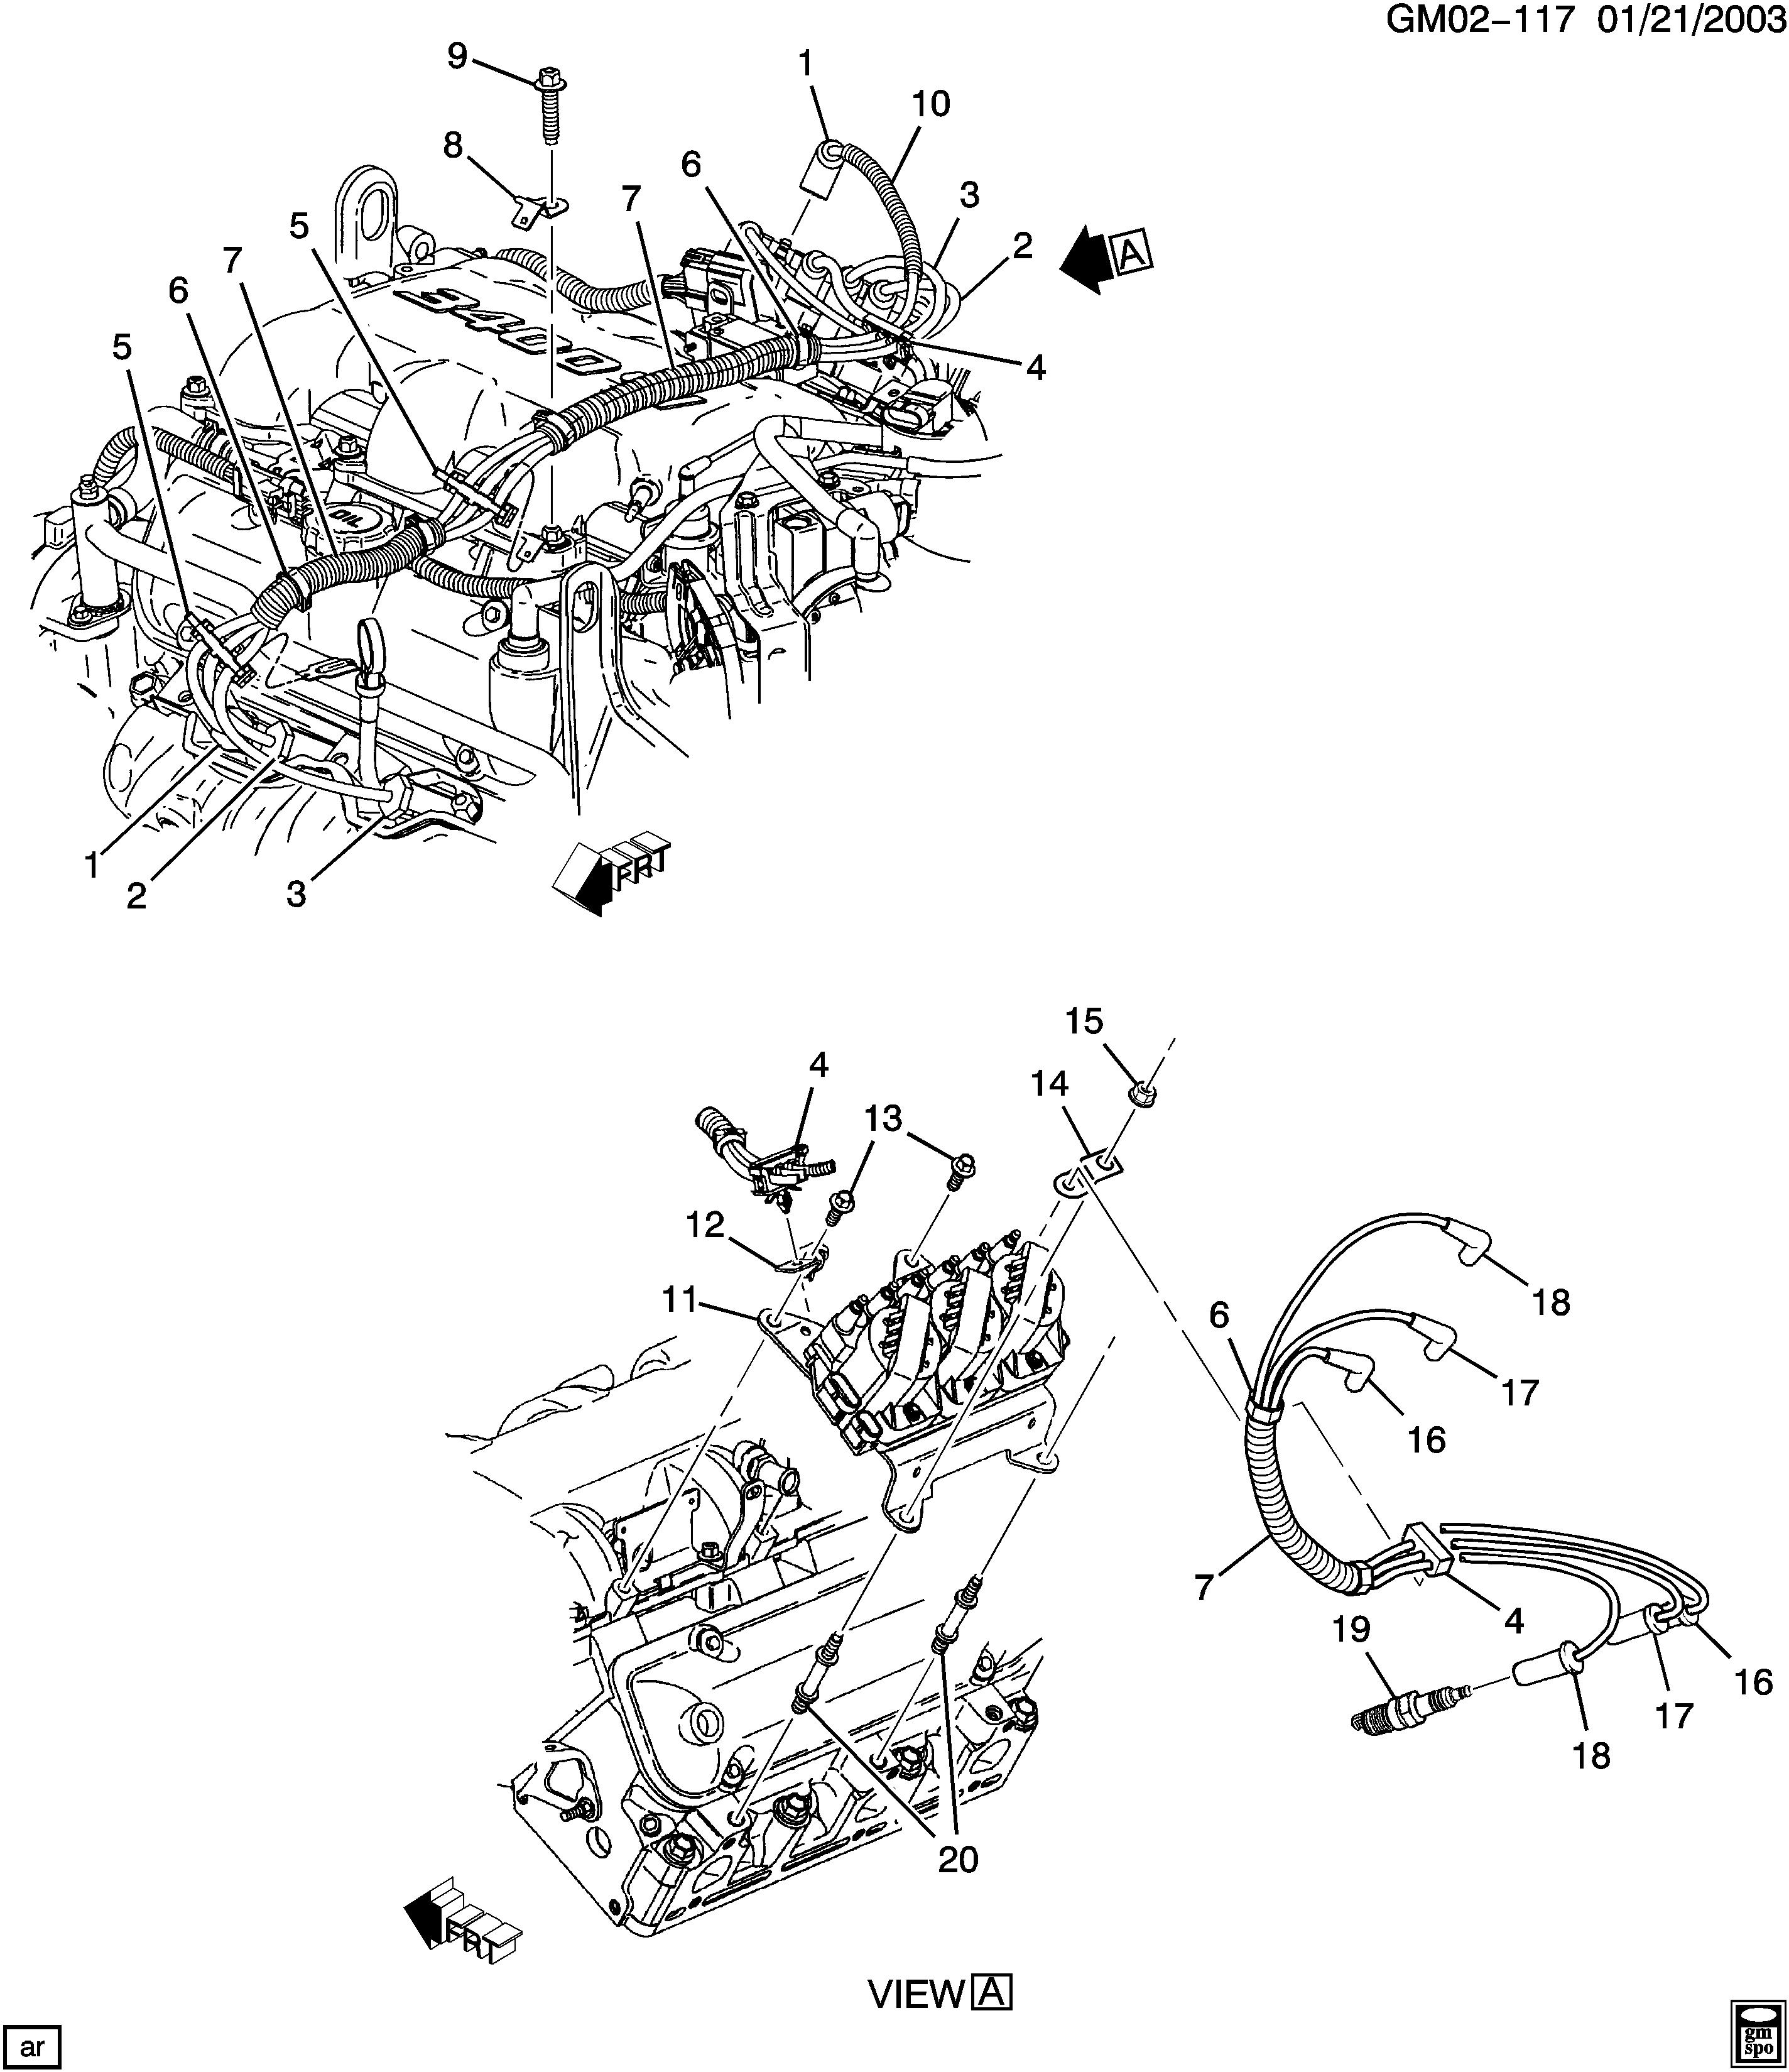 Pontiac Montana Wiring - Wiring Diagram